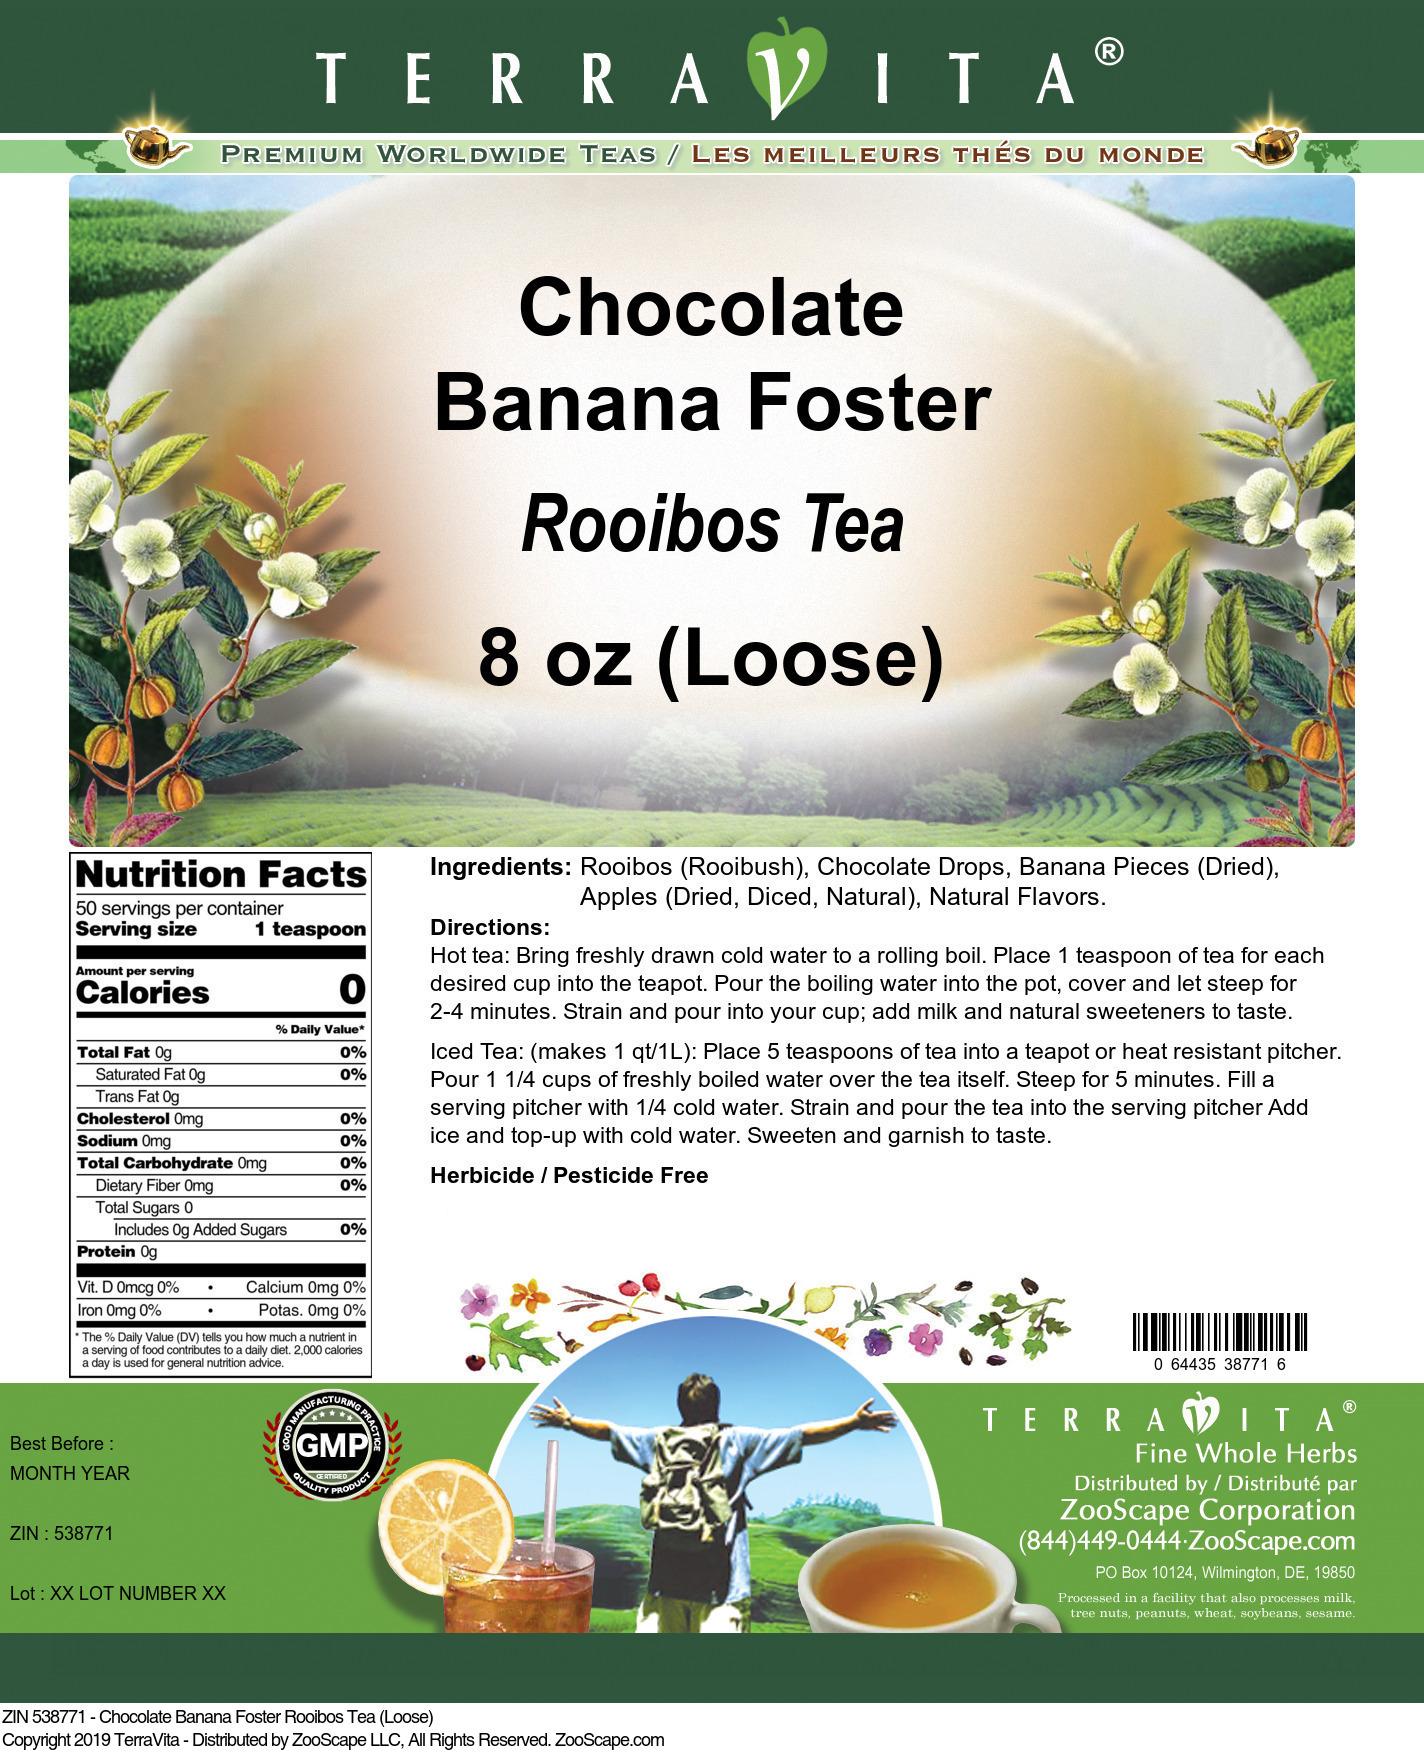 Chocolate Banana Foster Rooibos Tea (Loose)